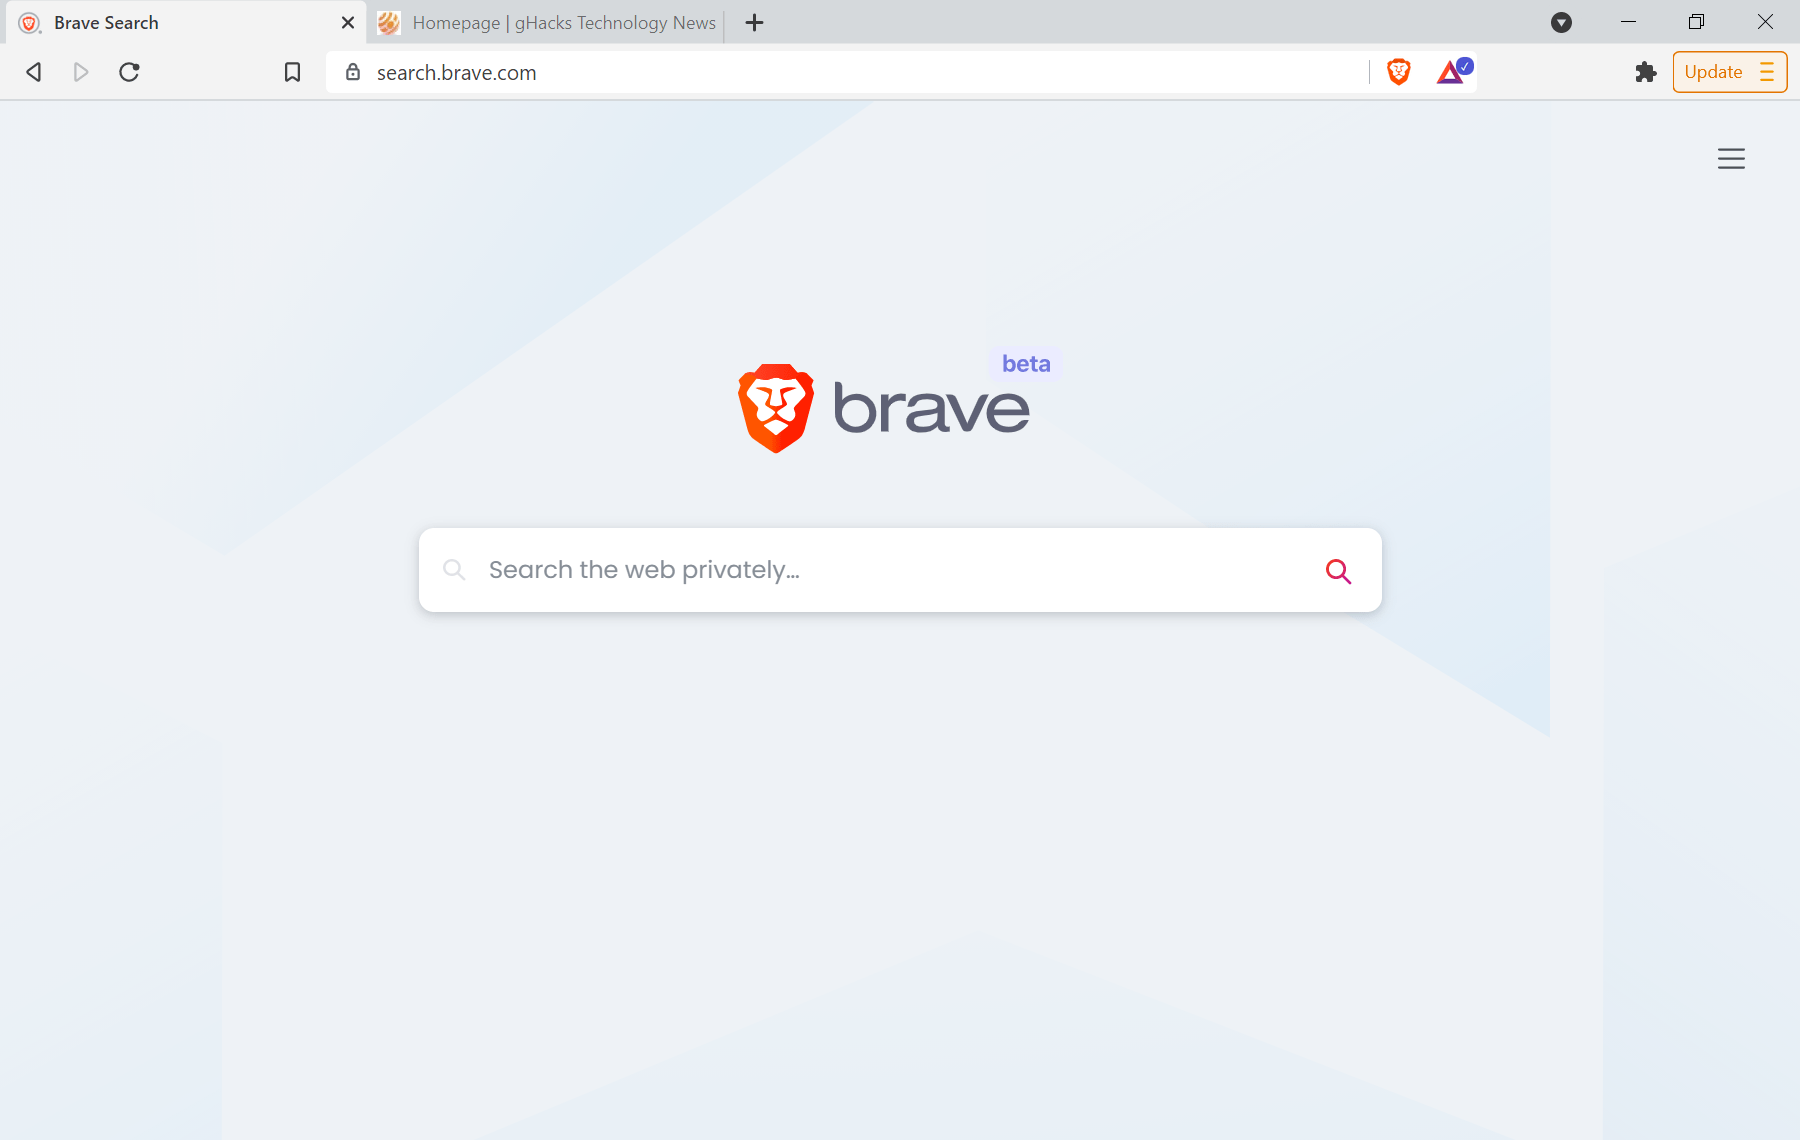 brave search beta